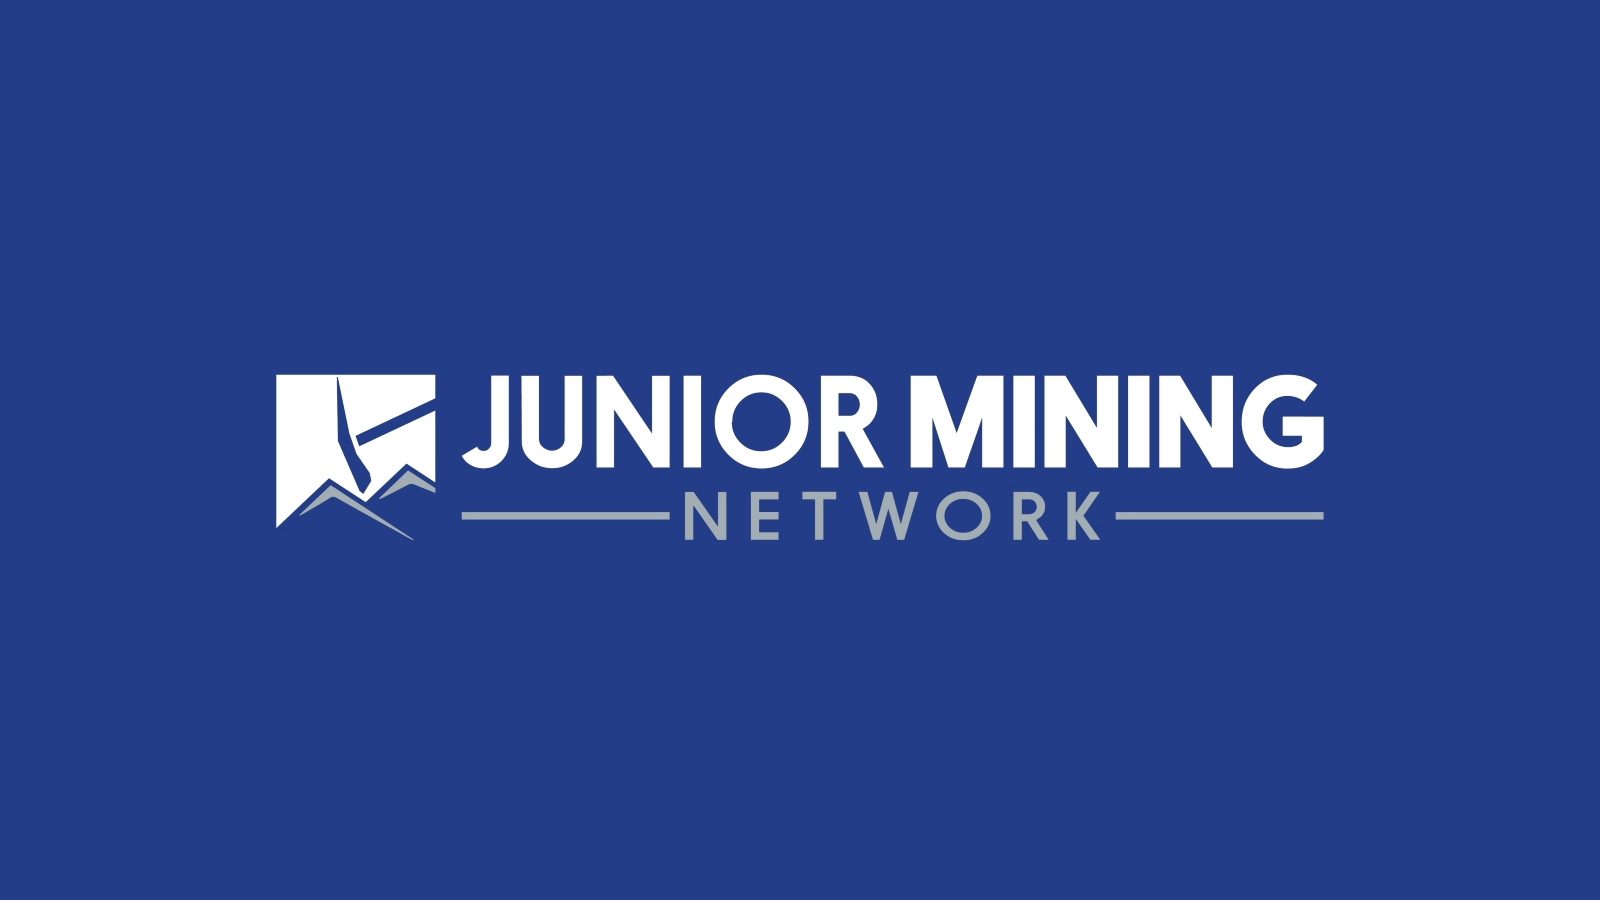 www.juniorminingnetwork.com